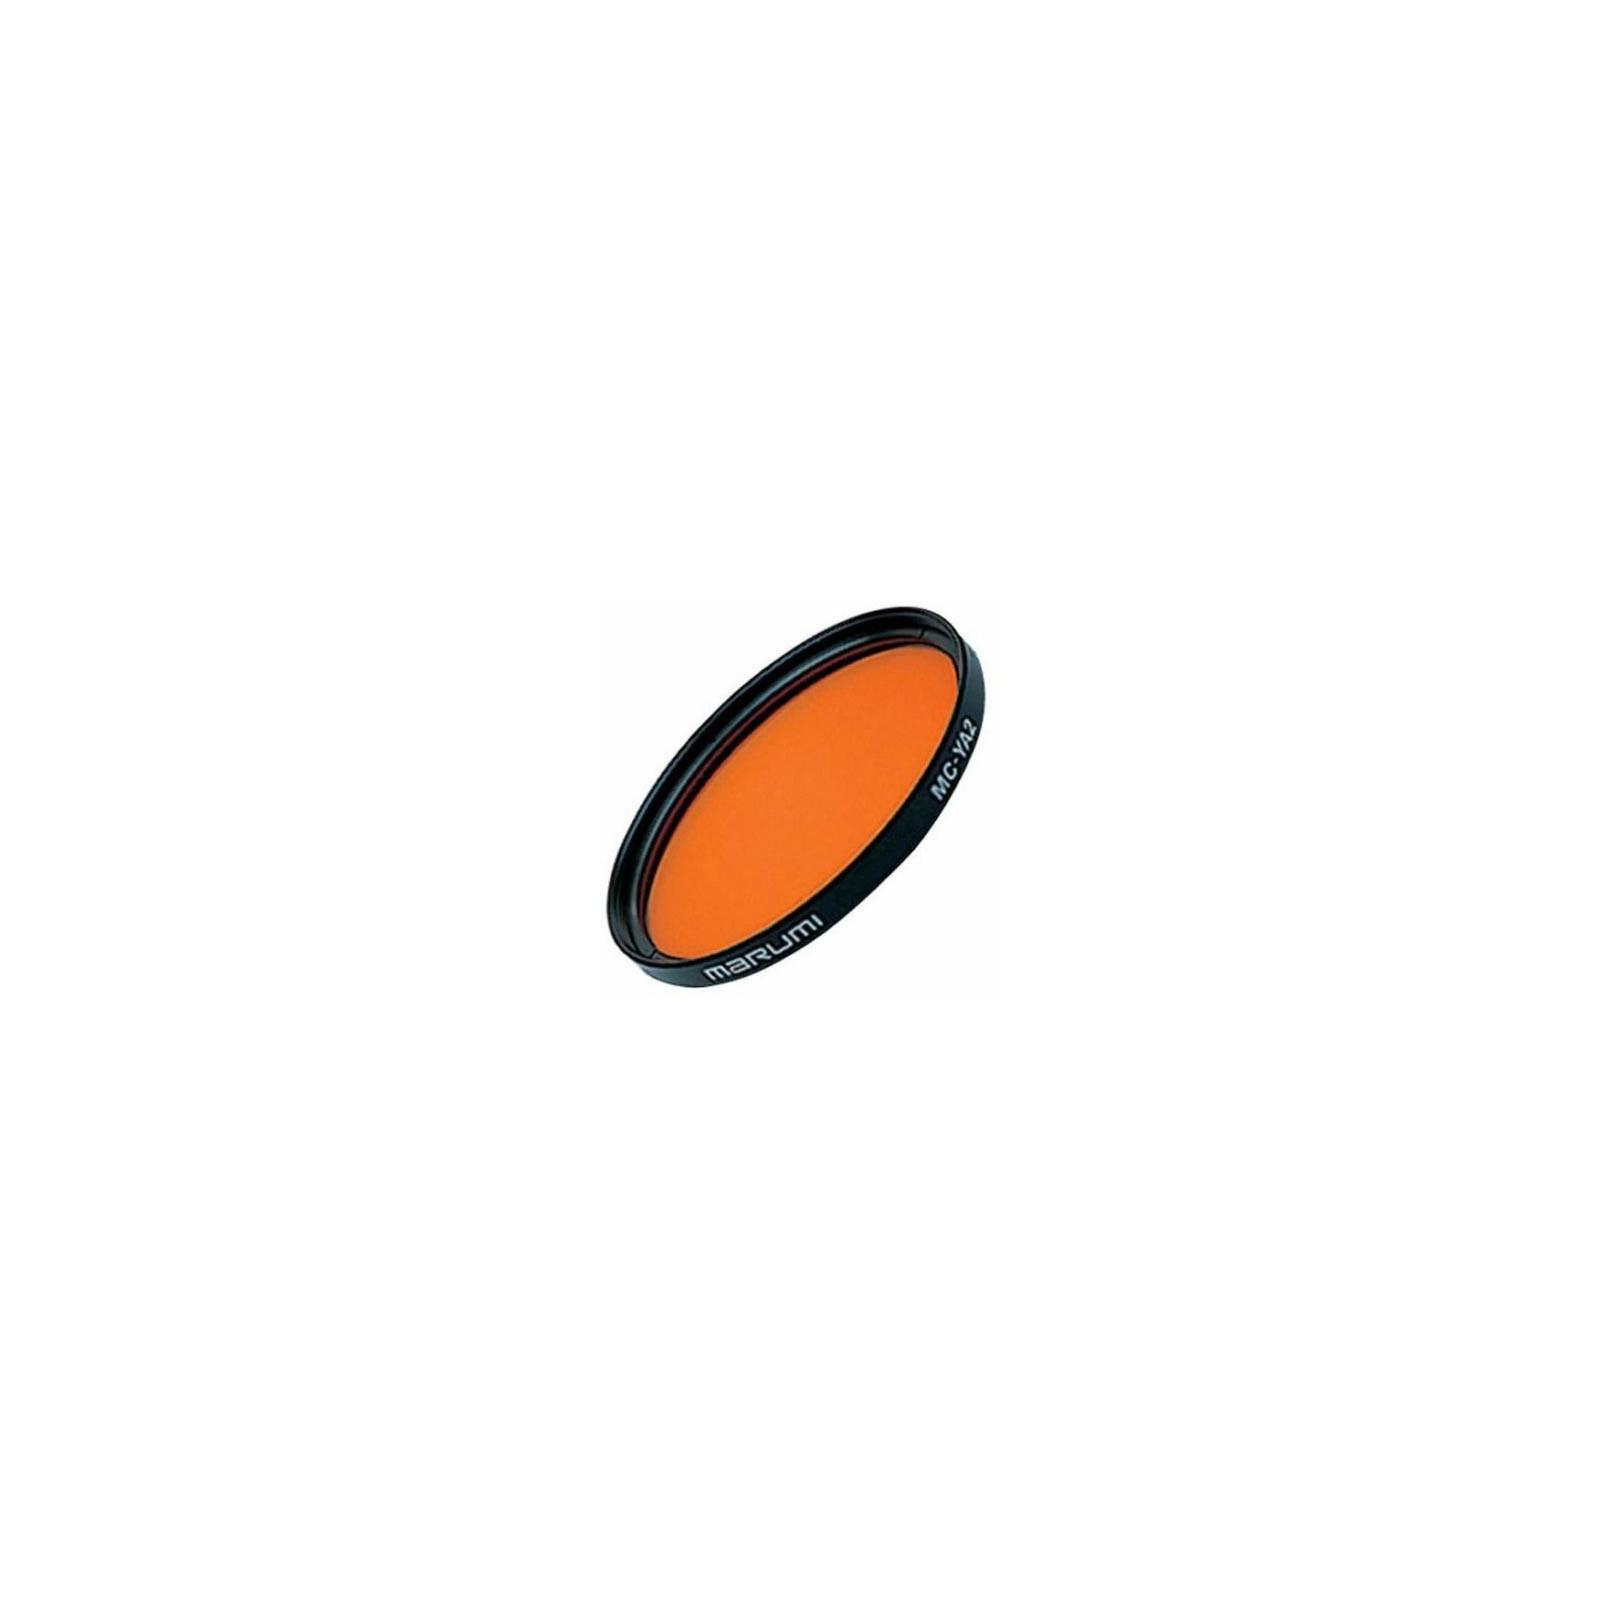 Светофильтр Marumi YА2 (orange) 62mm (Y2 (orange) 62mm)